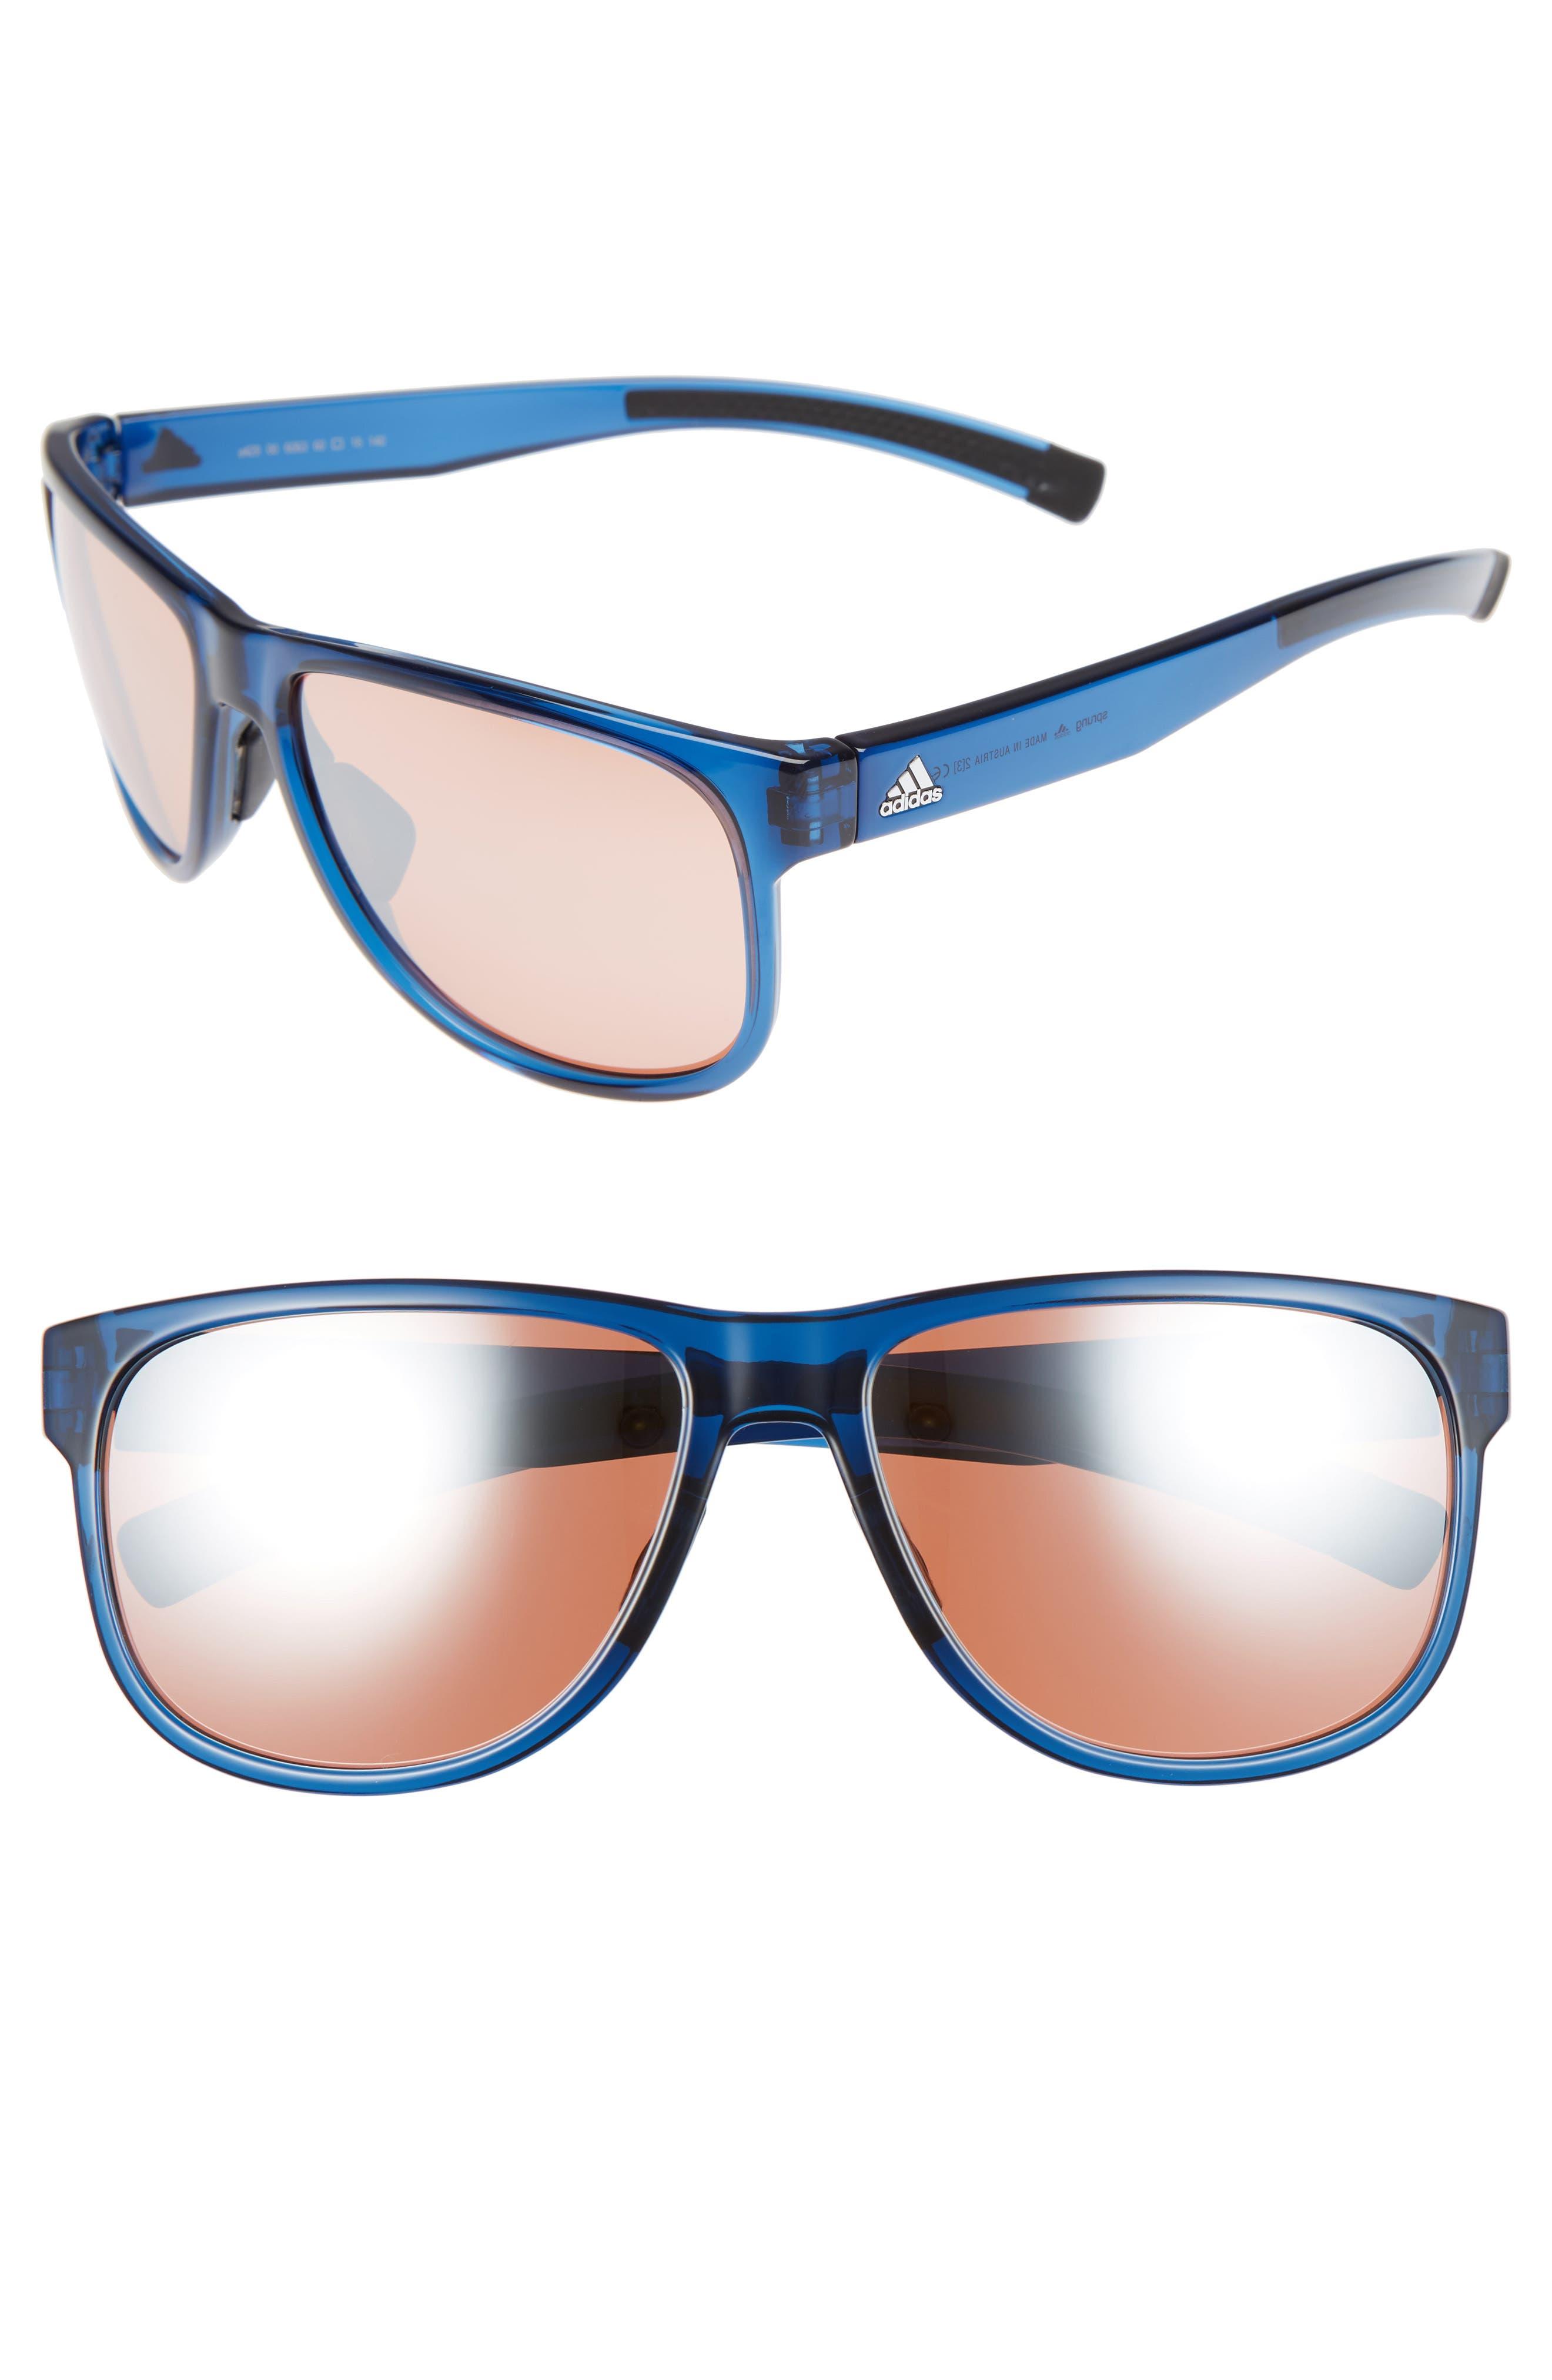 Sprung 60mm Sunglasses,                             Alternate thumbnail 2, color,                             400